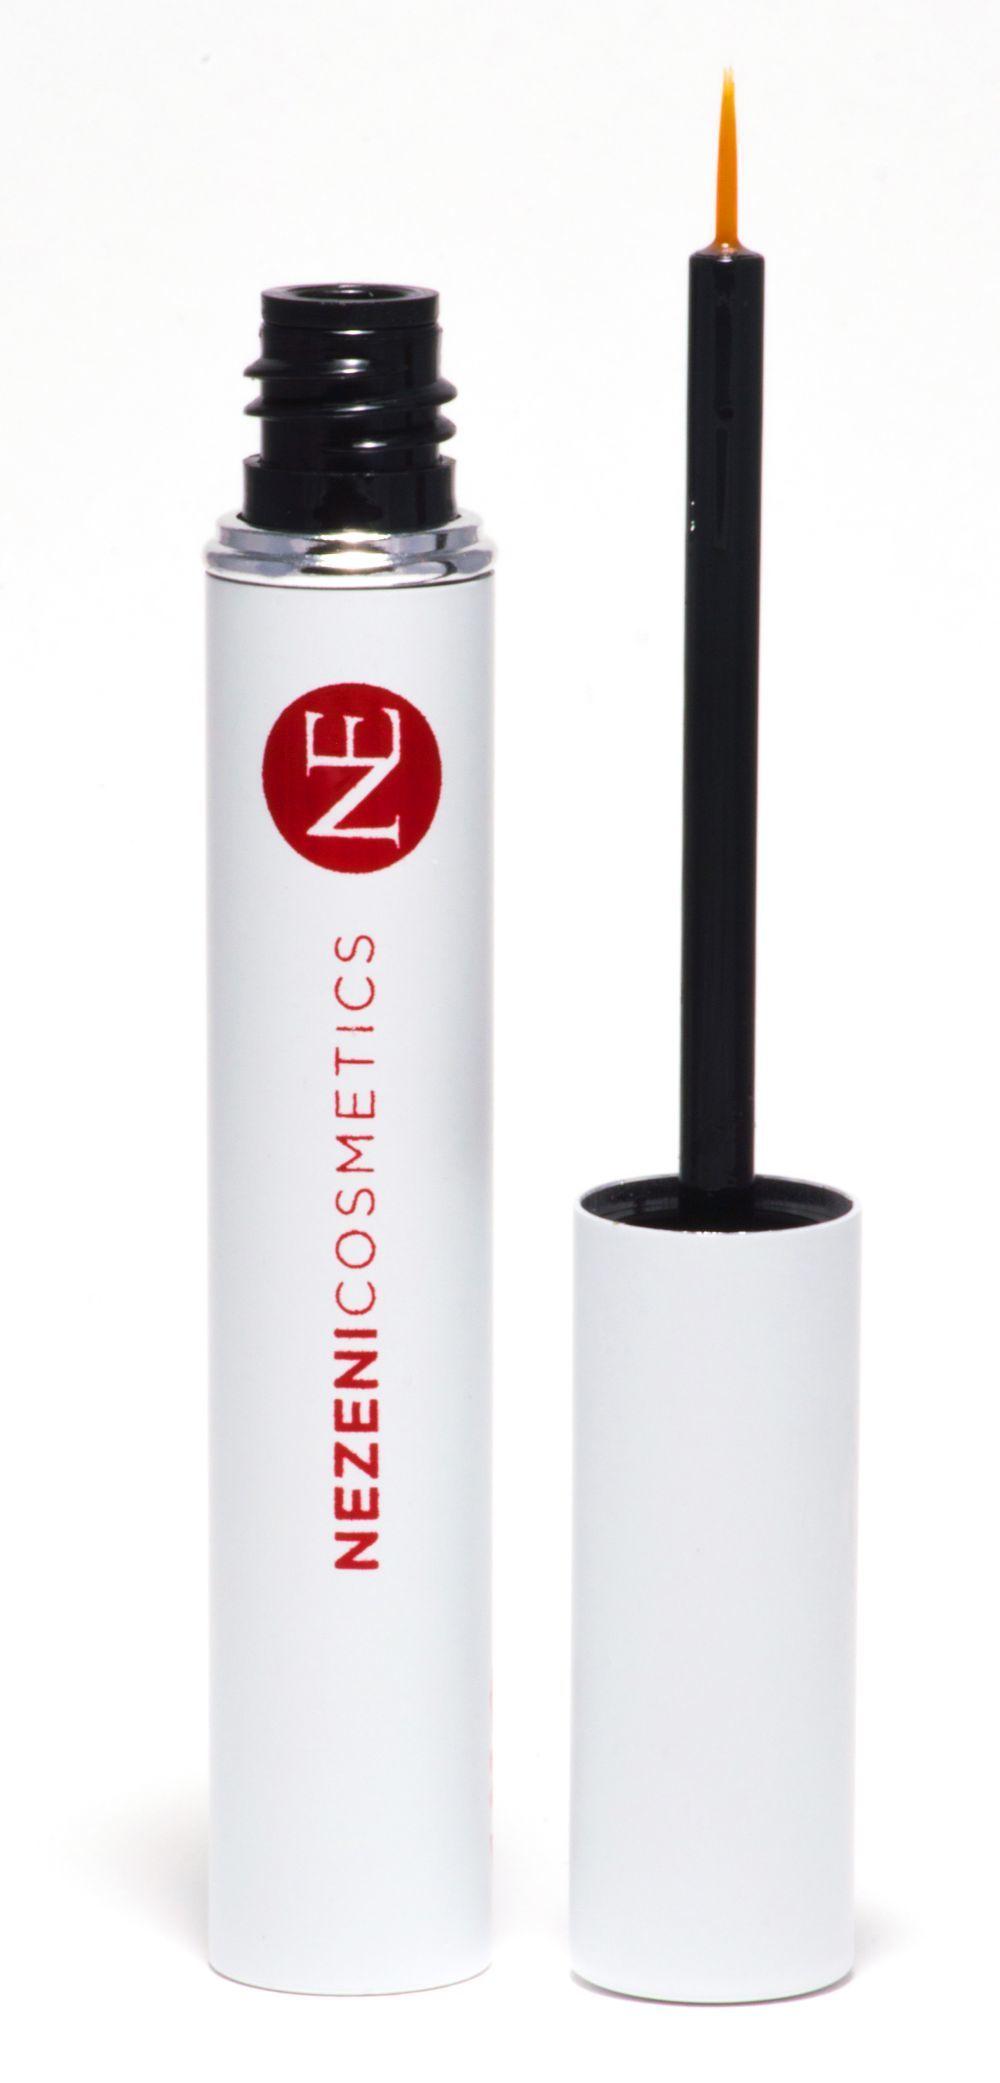 Tratamiento sérum para pestañas y cejas de Nezeni Cosmetics.